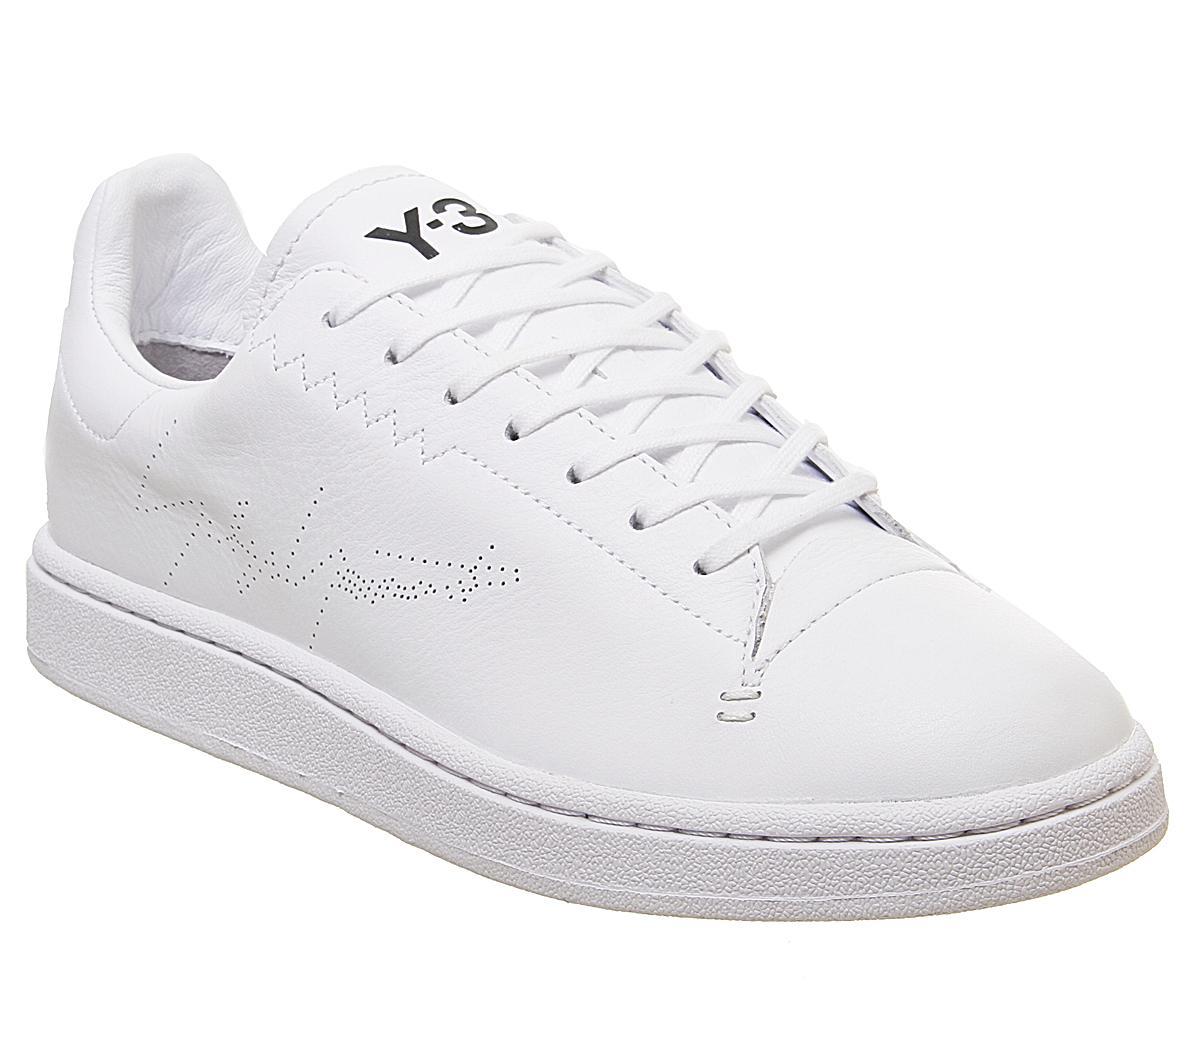 adidas Y3 Y3 Yohji Court Trainers White